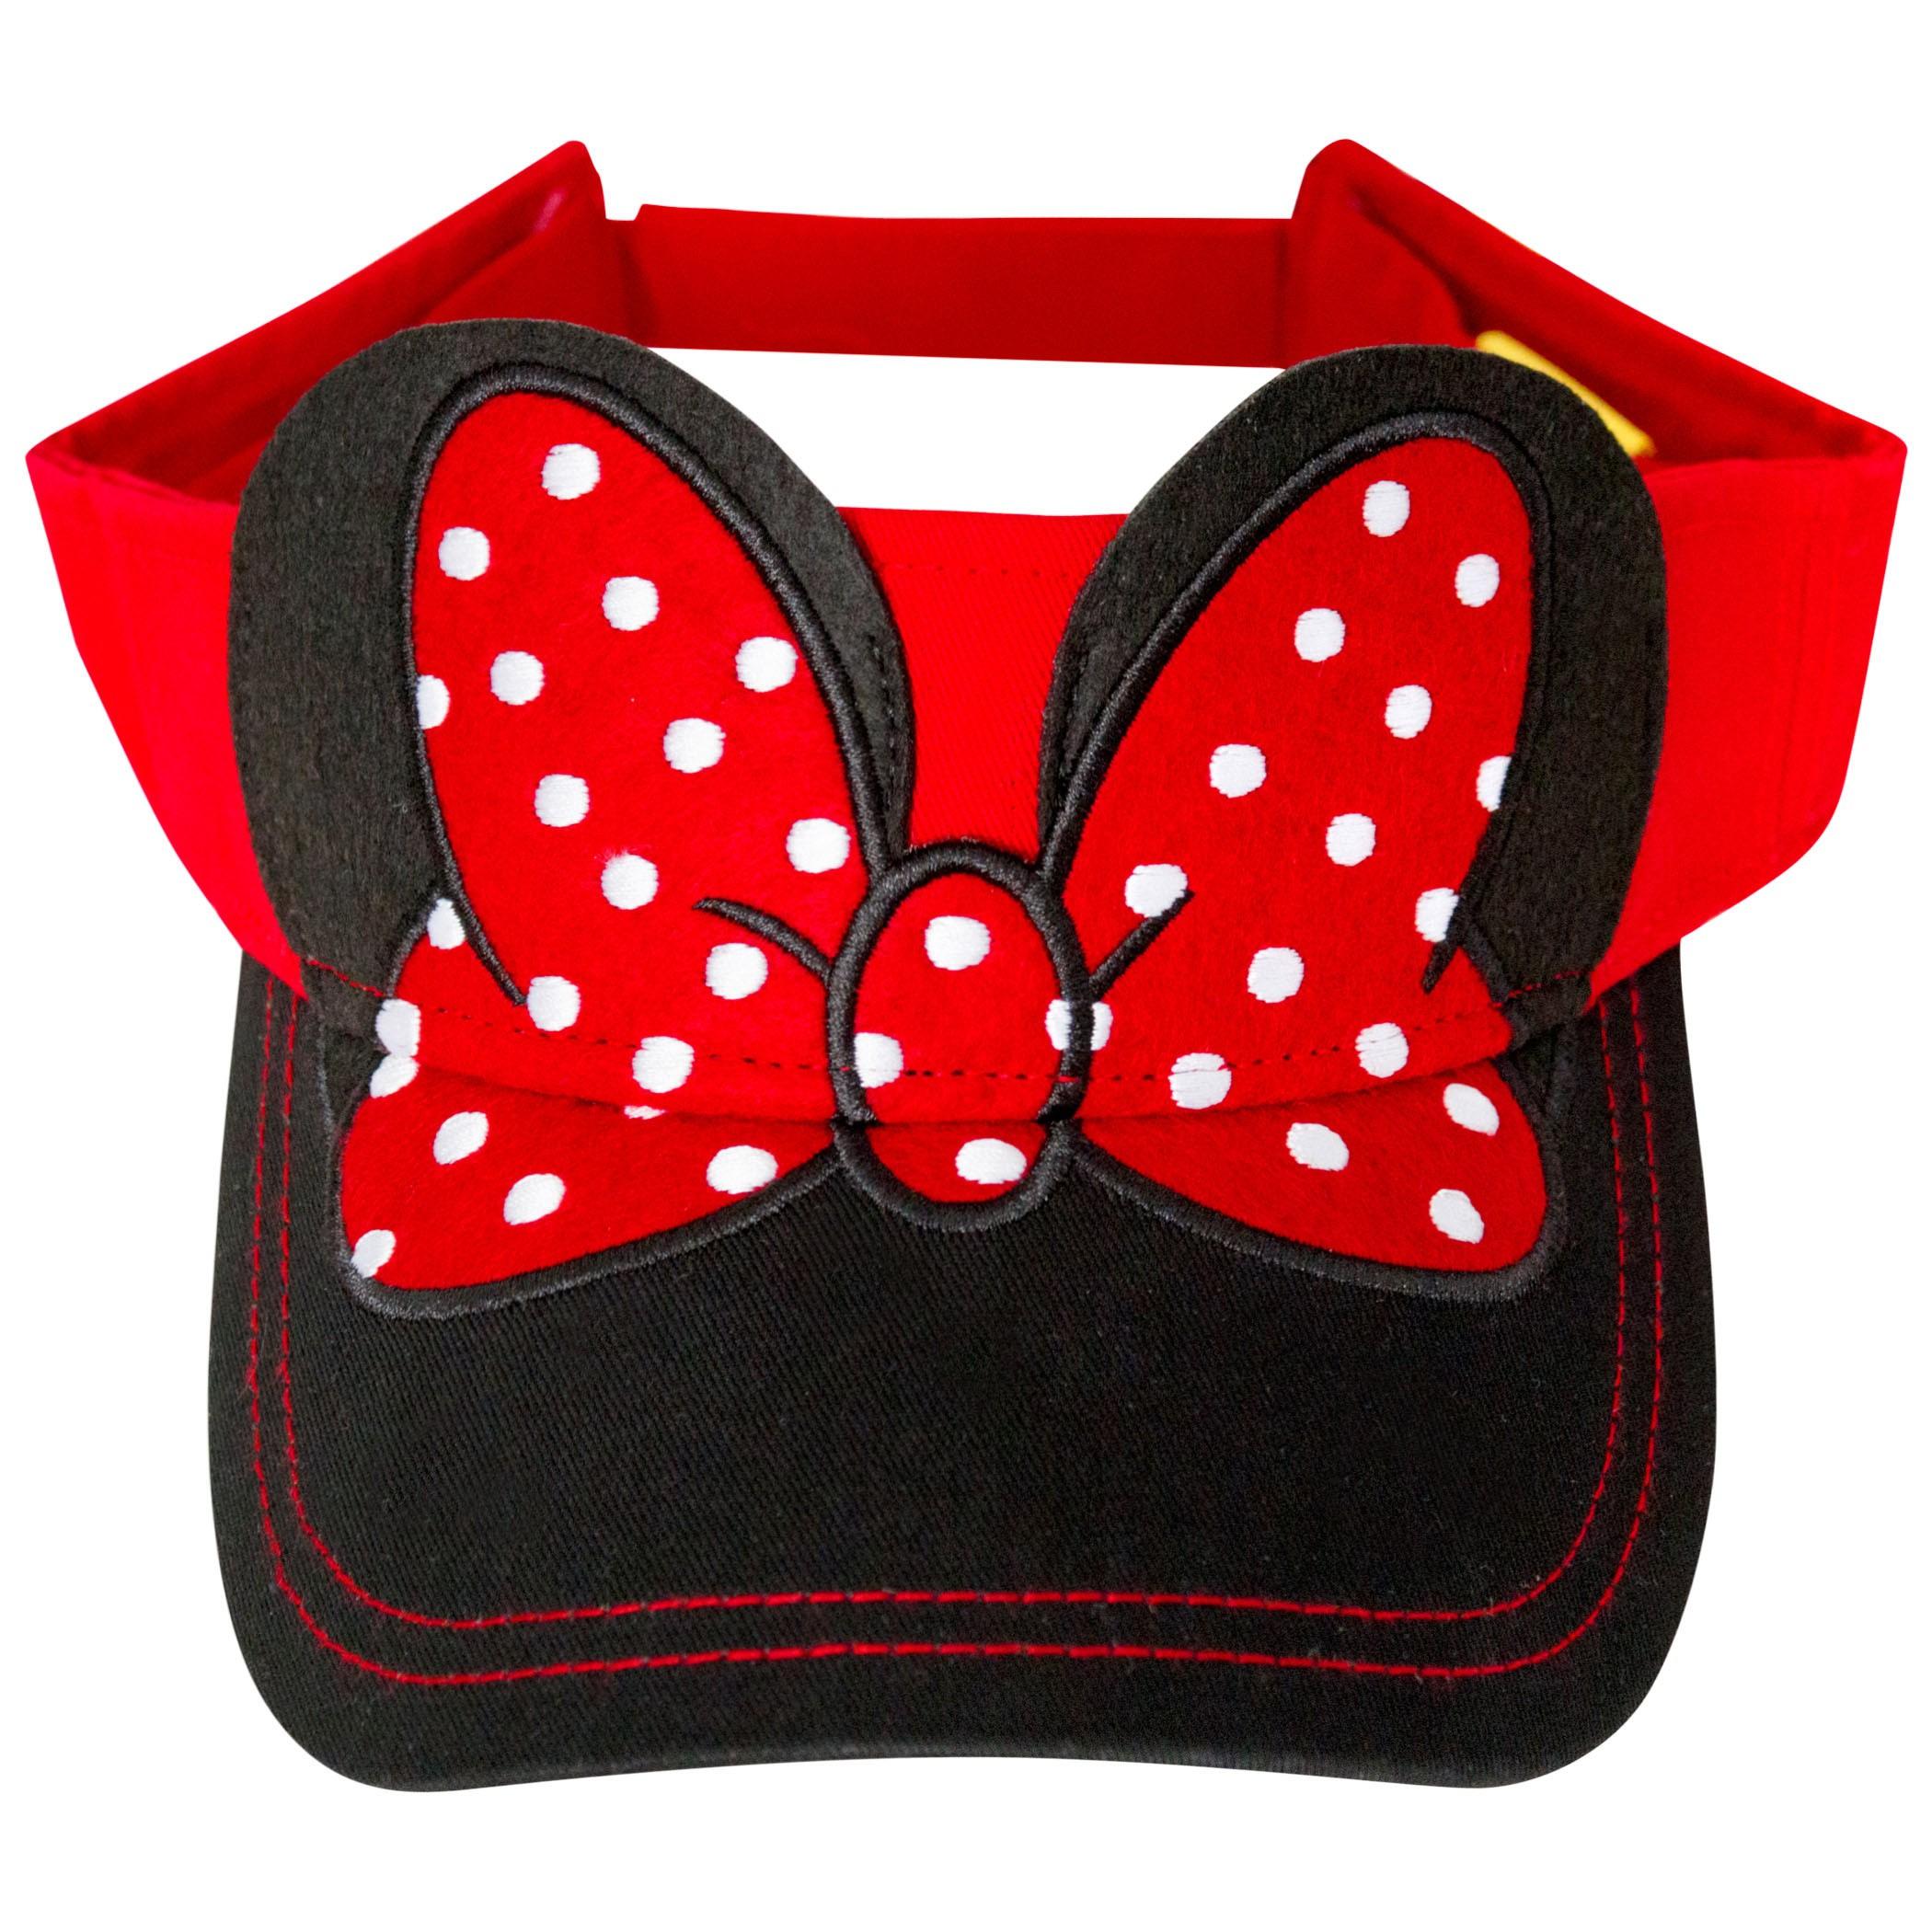 Minnie Mouse Ears and Bow Visor